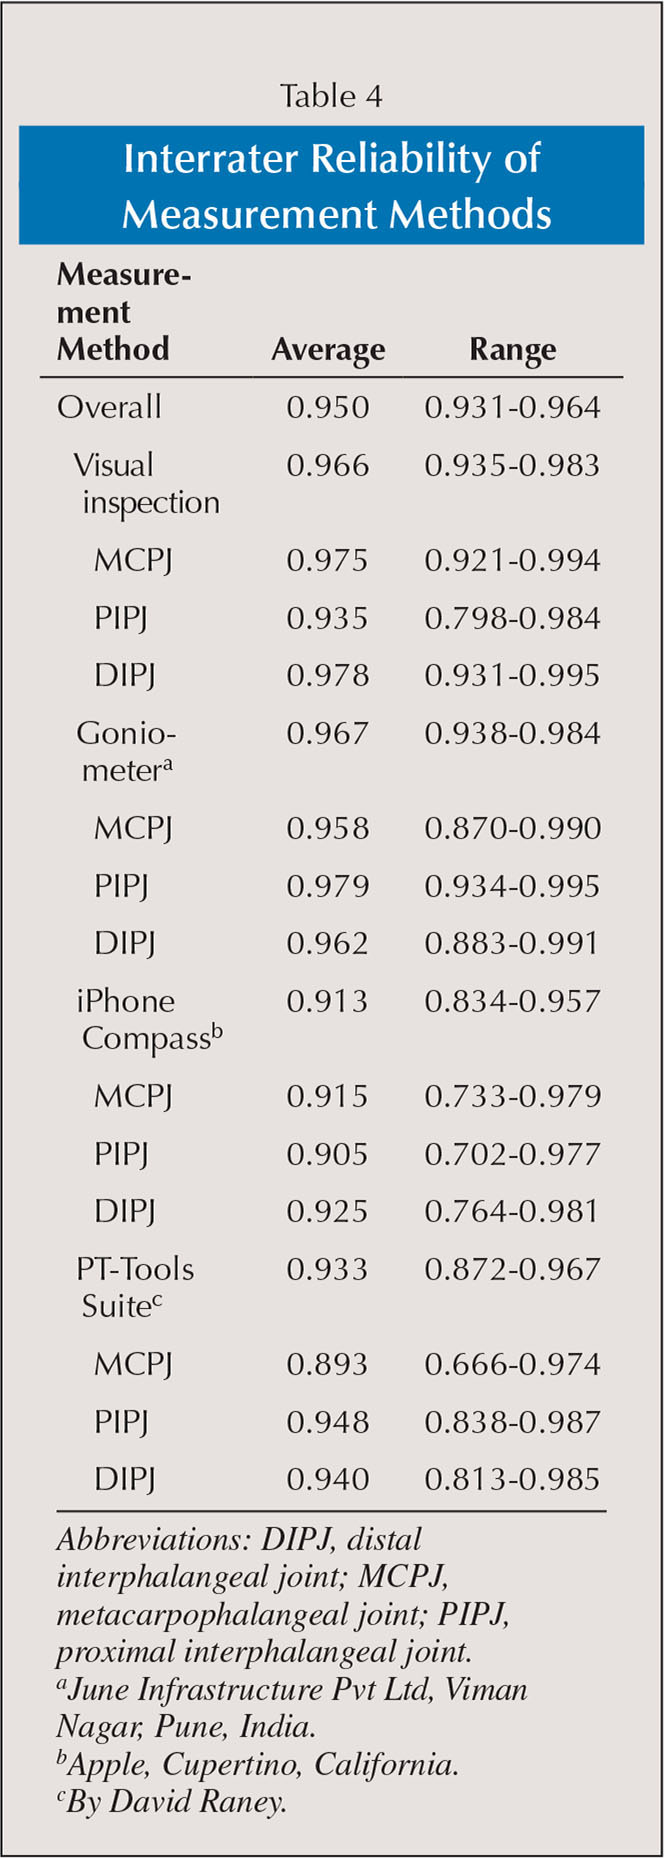 Interrater Reliability of Measurement Methods